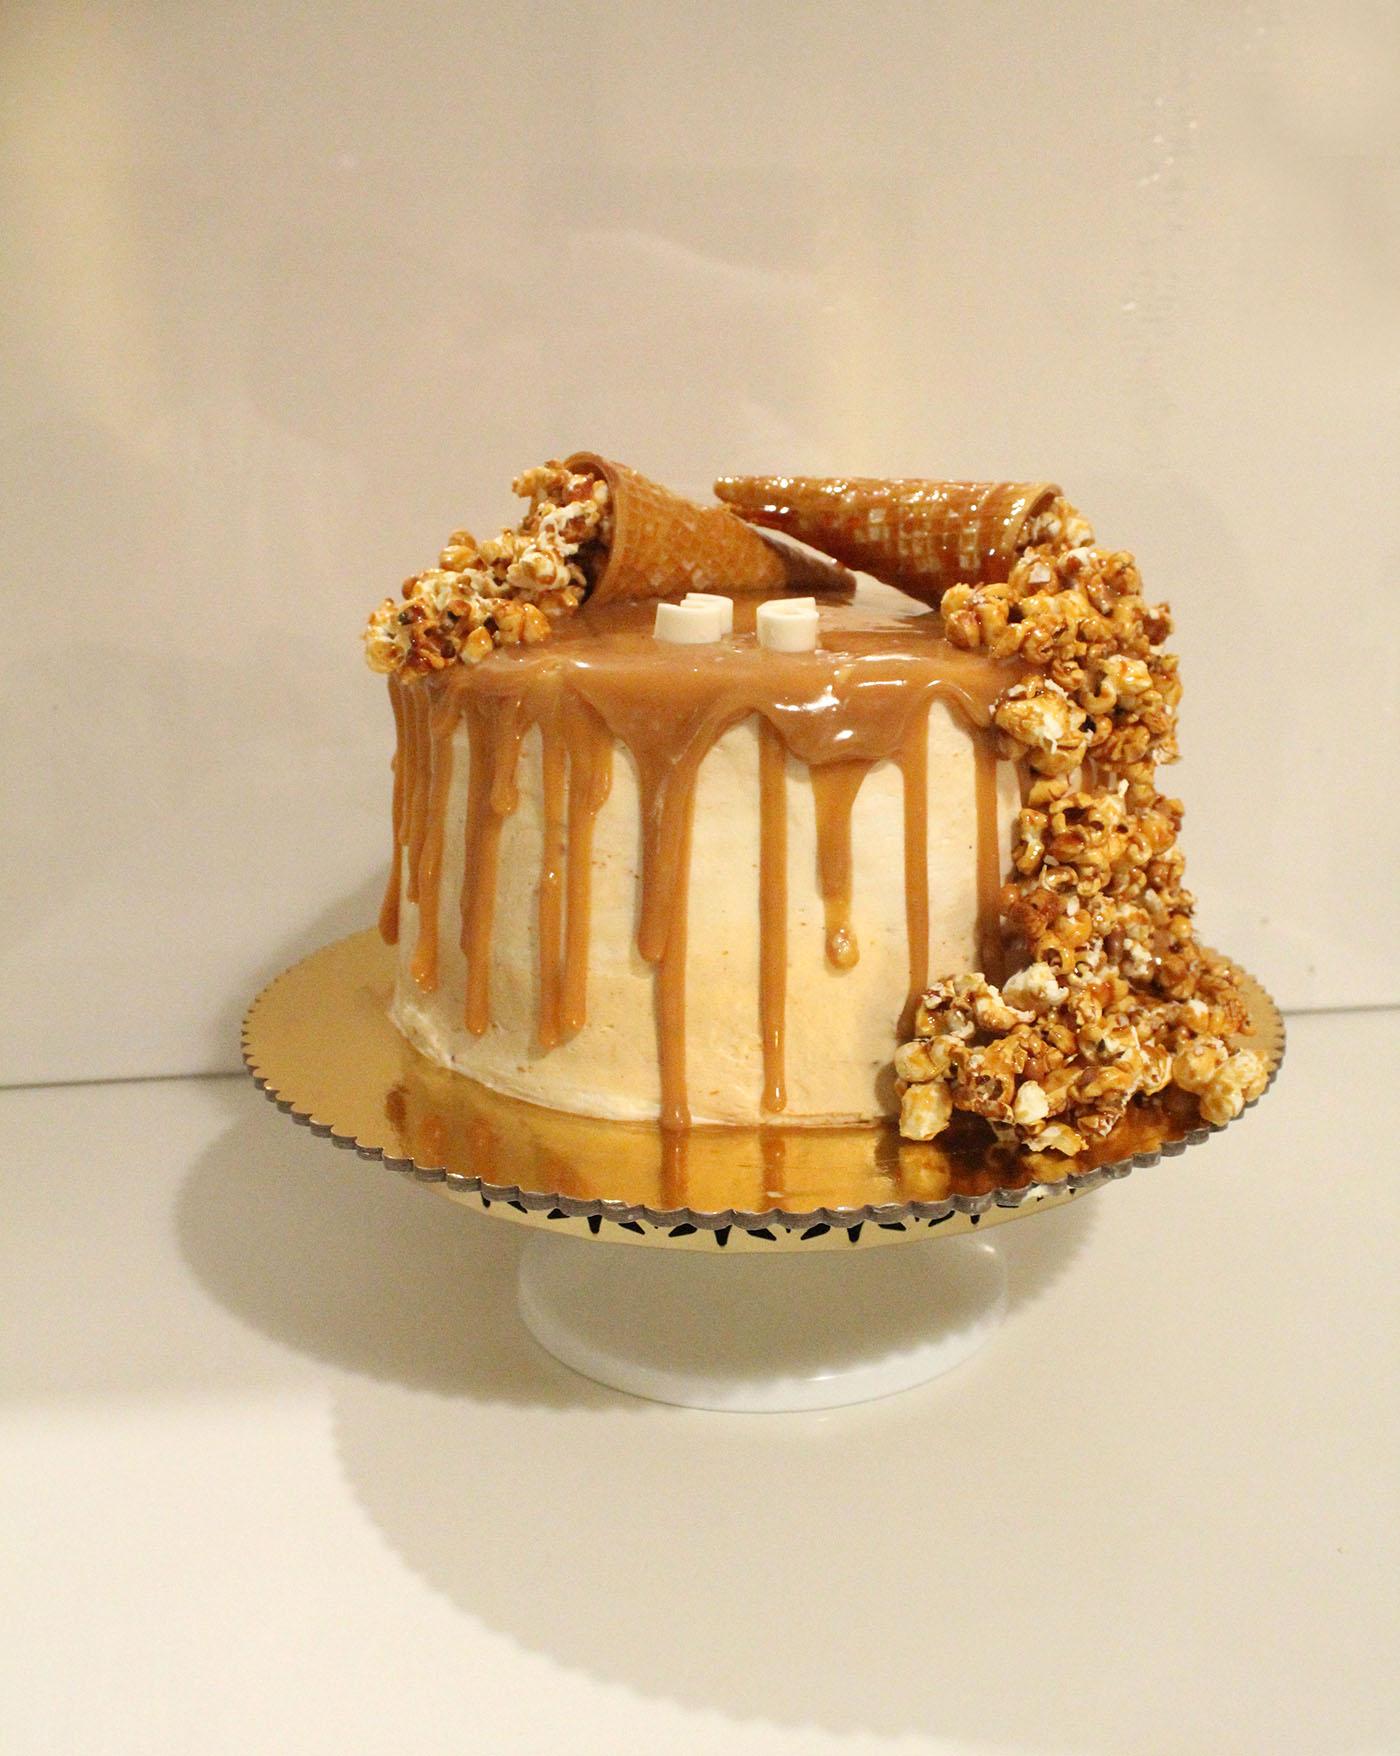 IMG 9461 1 - עוגת זילוף